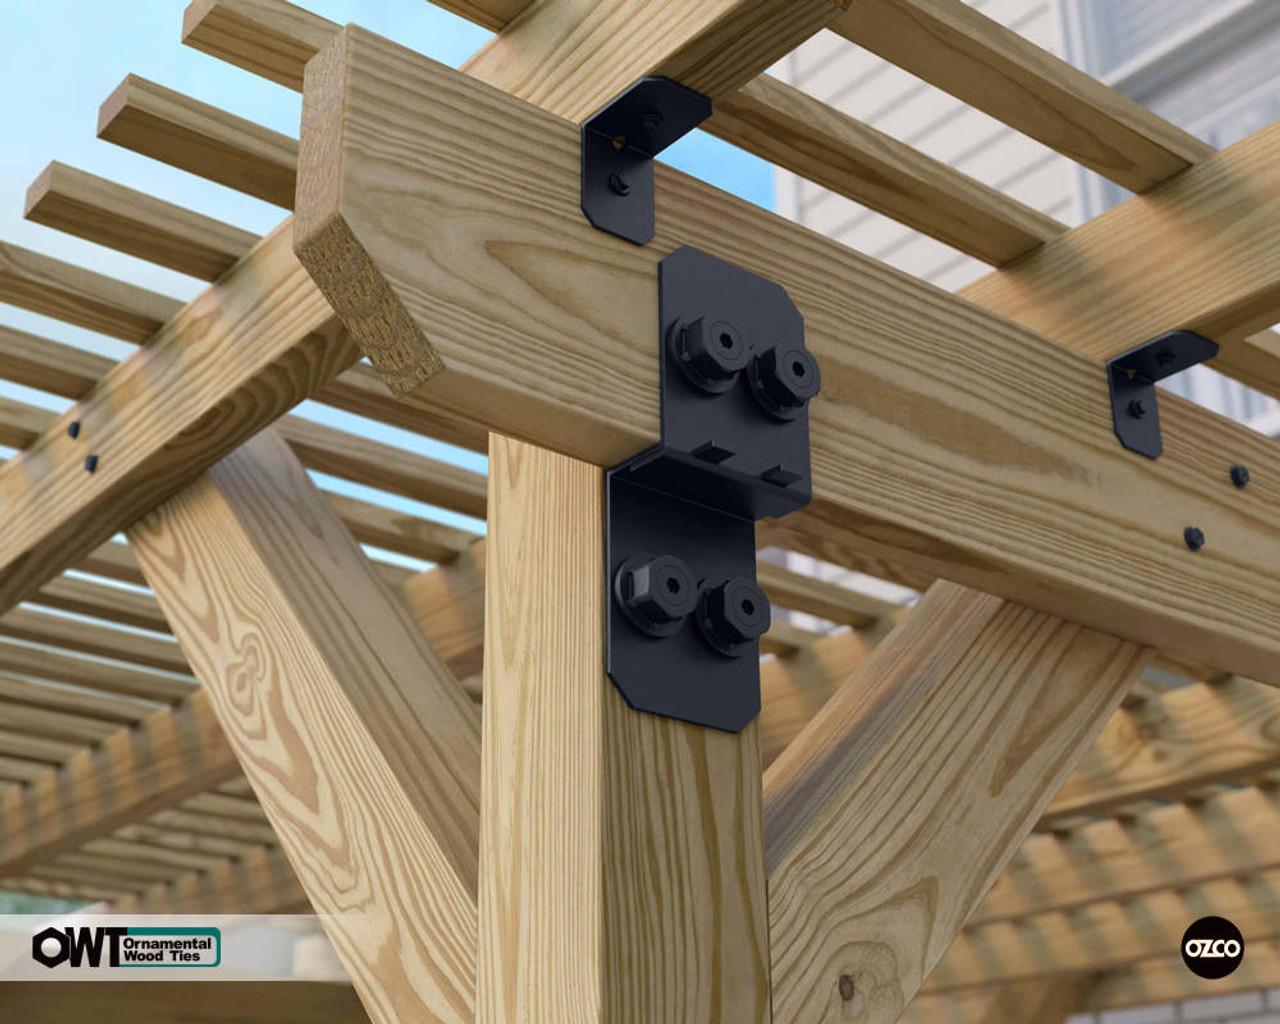 Wood Pergola Built with OZCO OWT Post to Beam Connectors